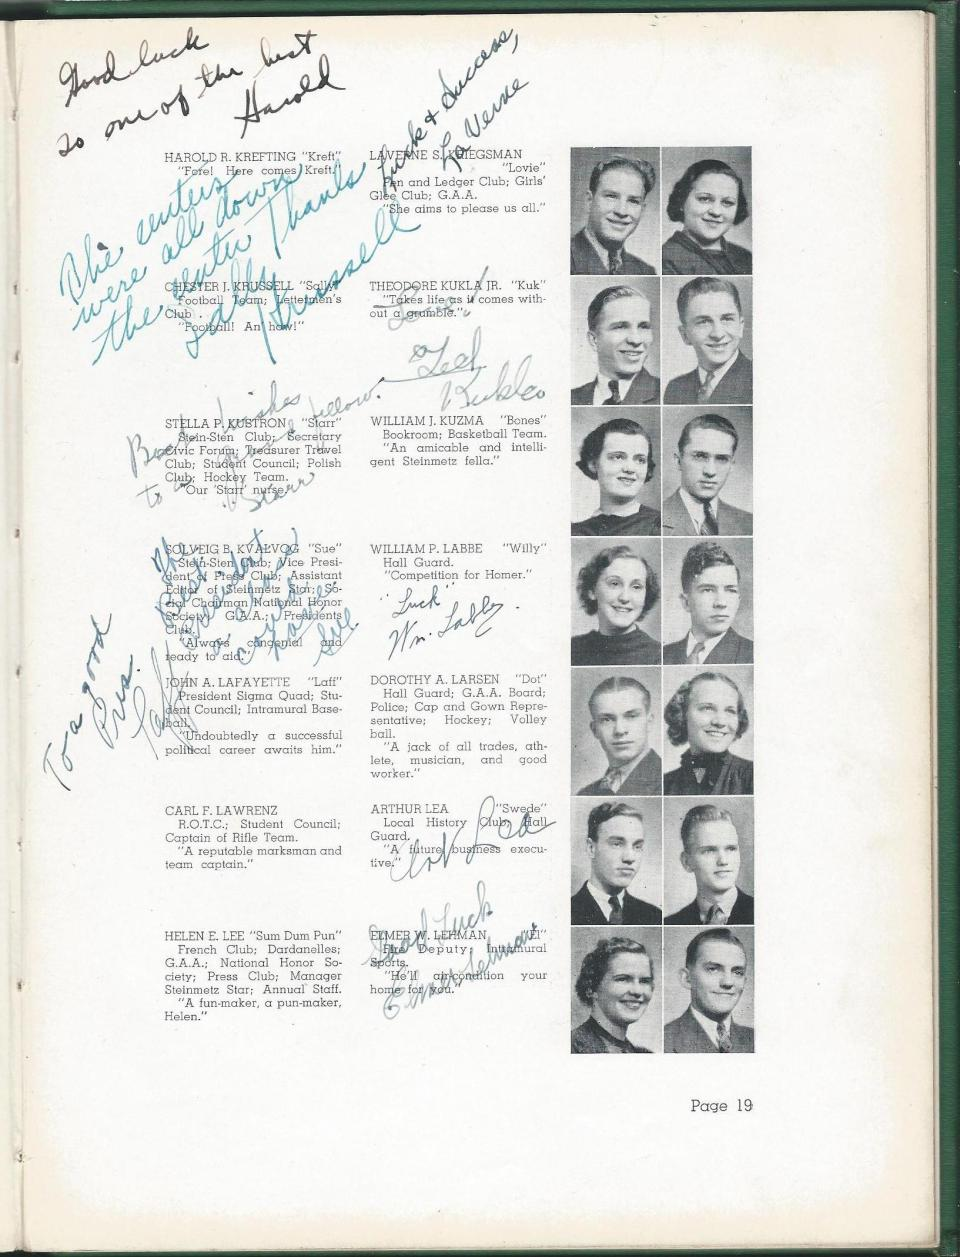 1938 HS Yearbook pg 19